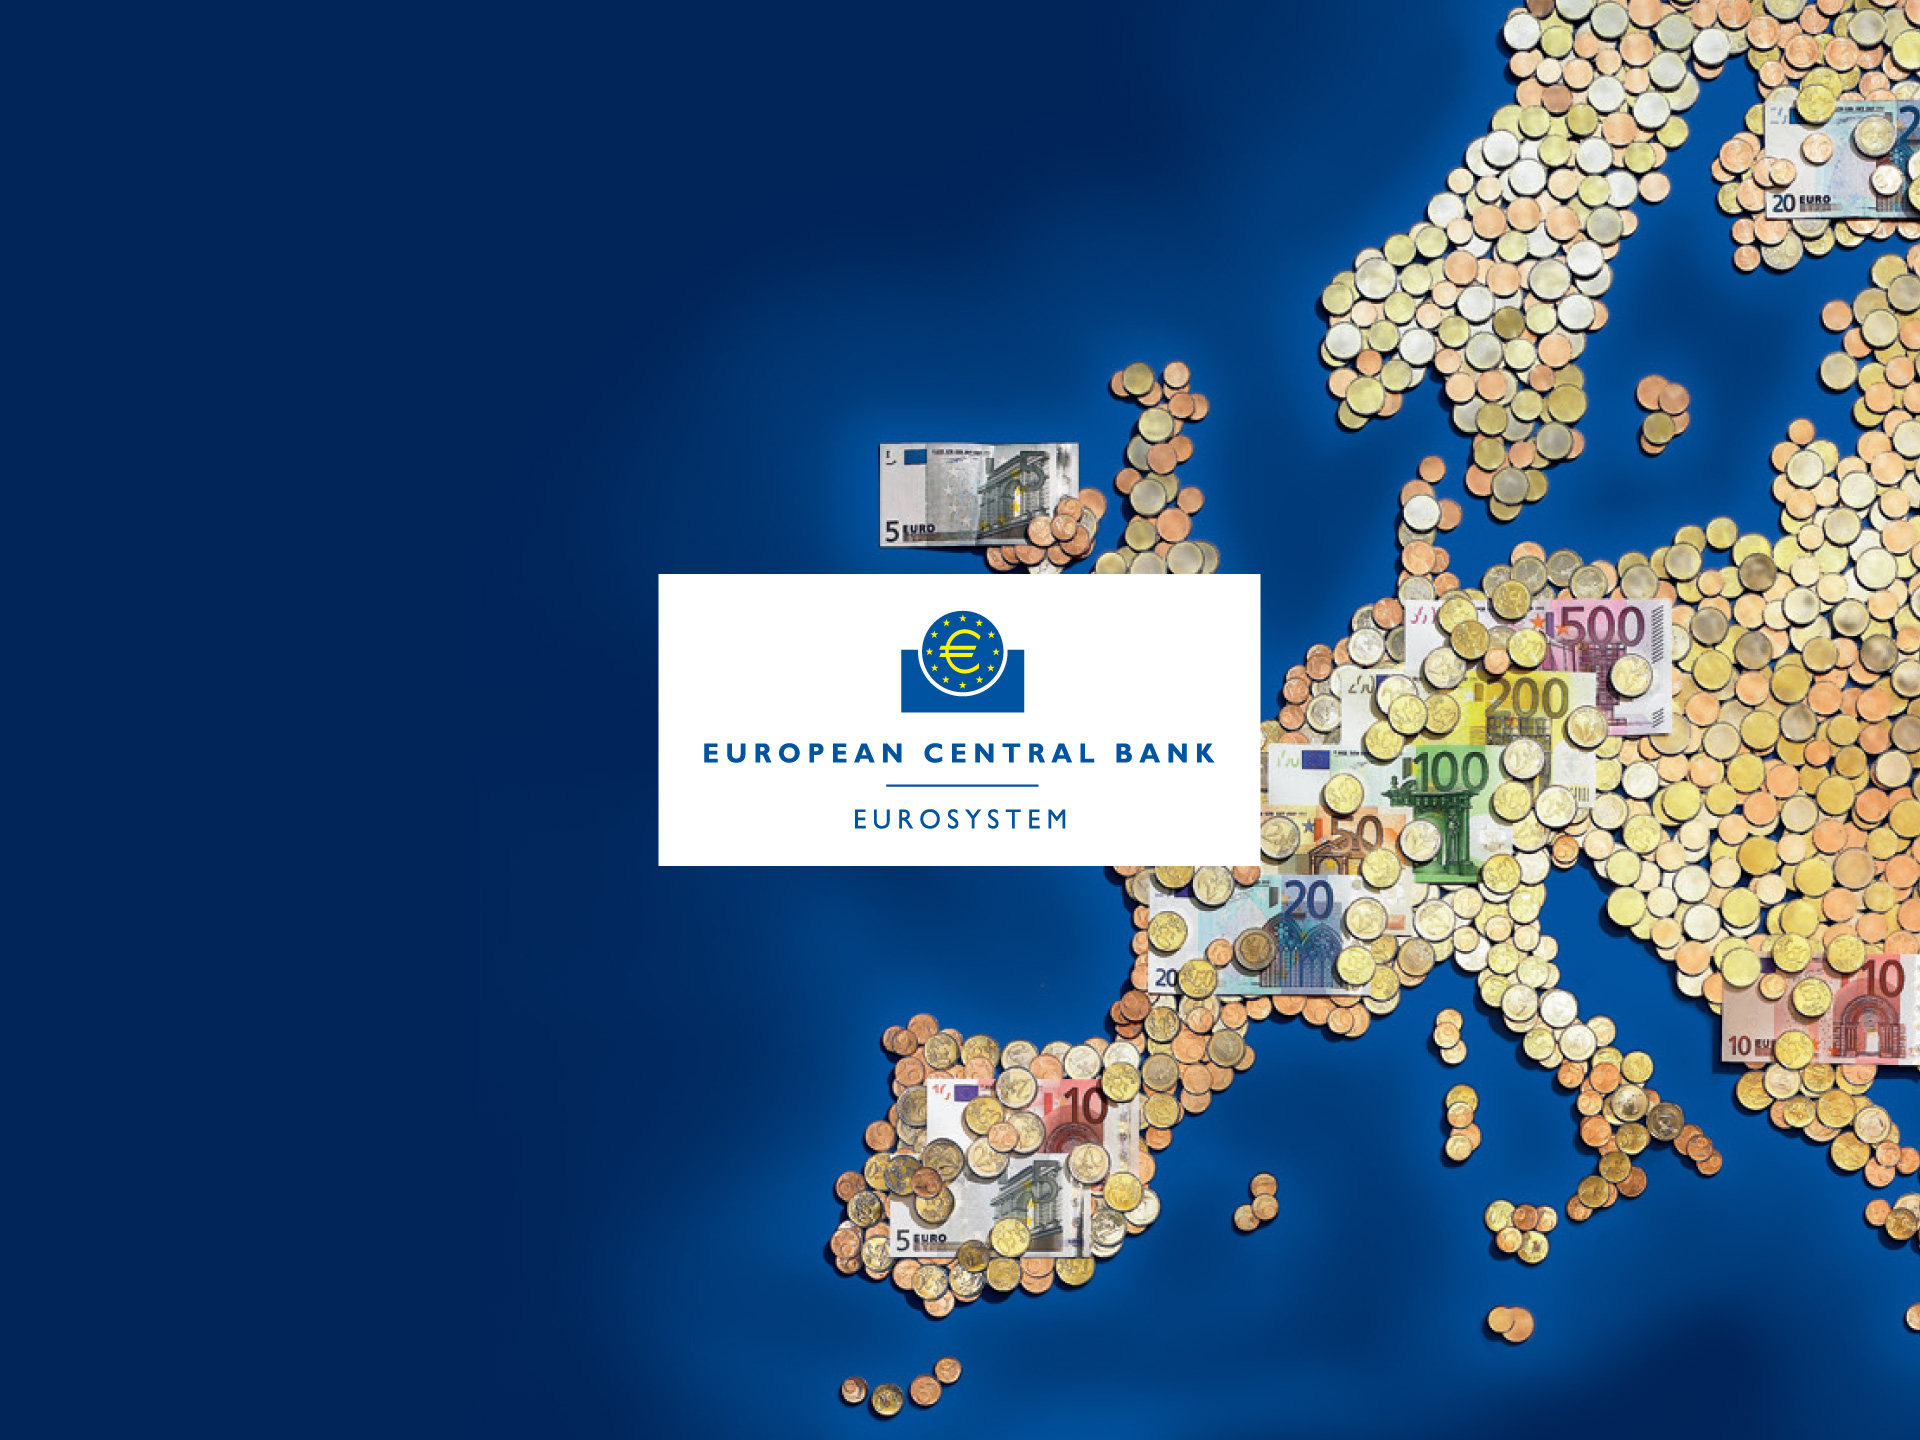 KW_www2016_EU_Central_Bank